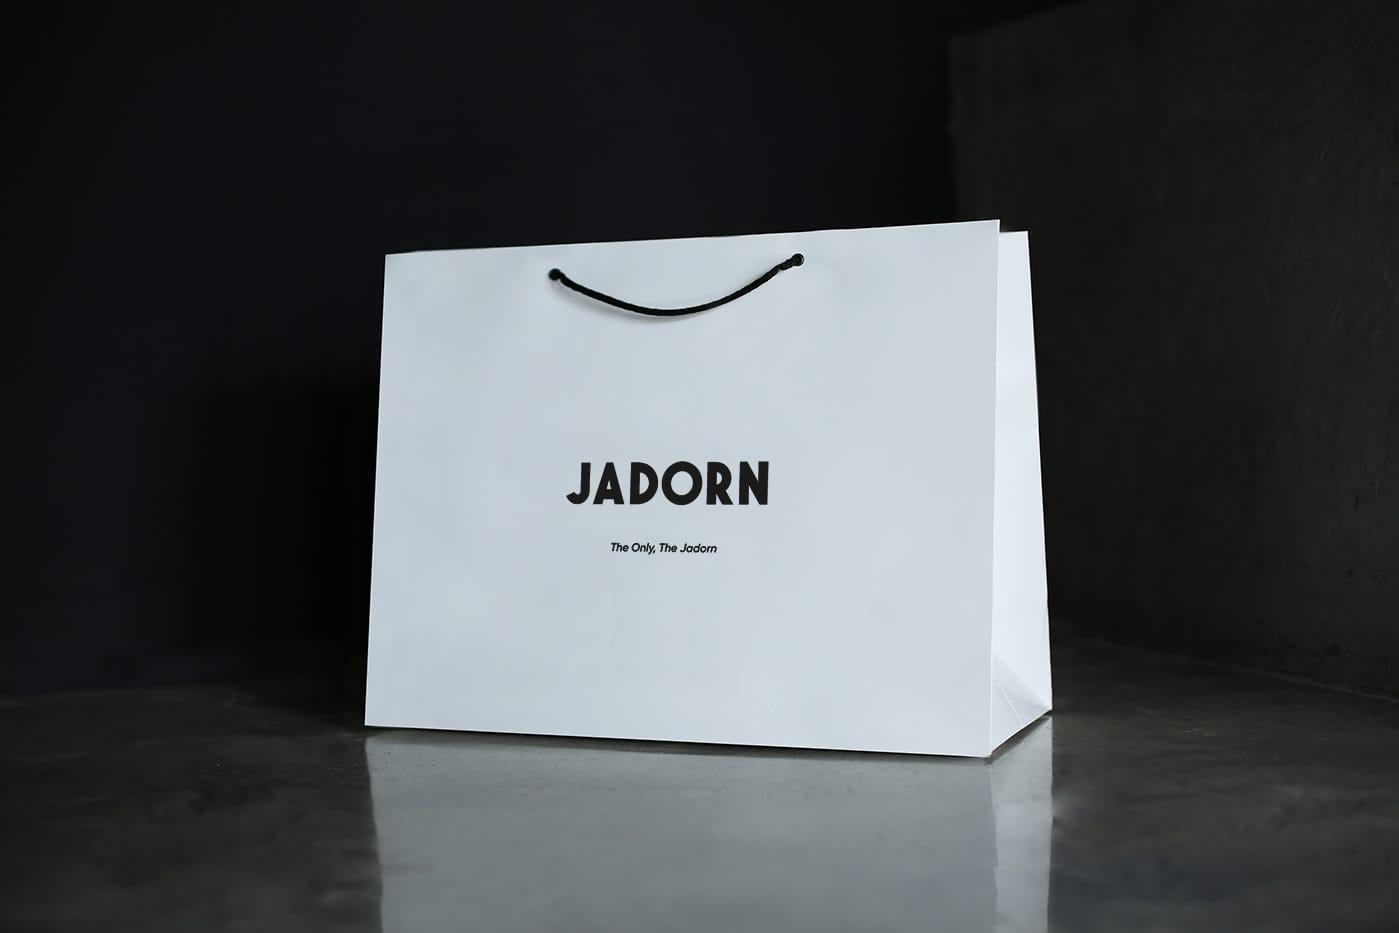 JADORN时尚女装品牌广告-12